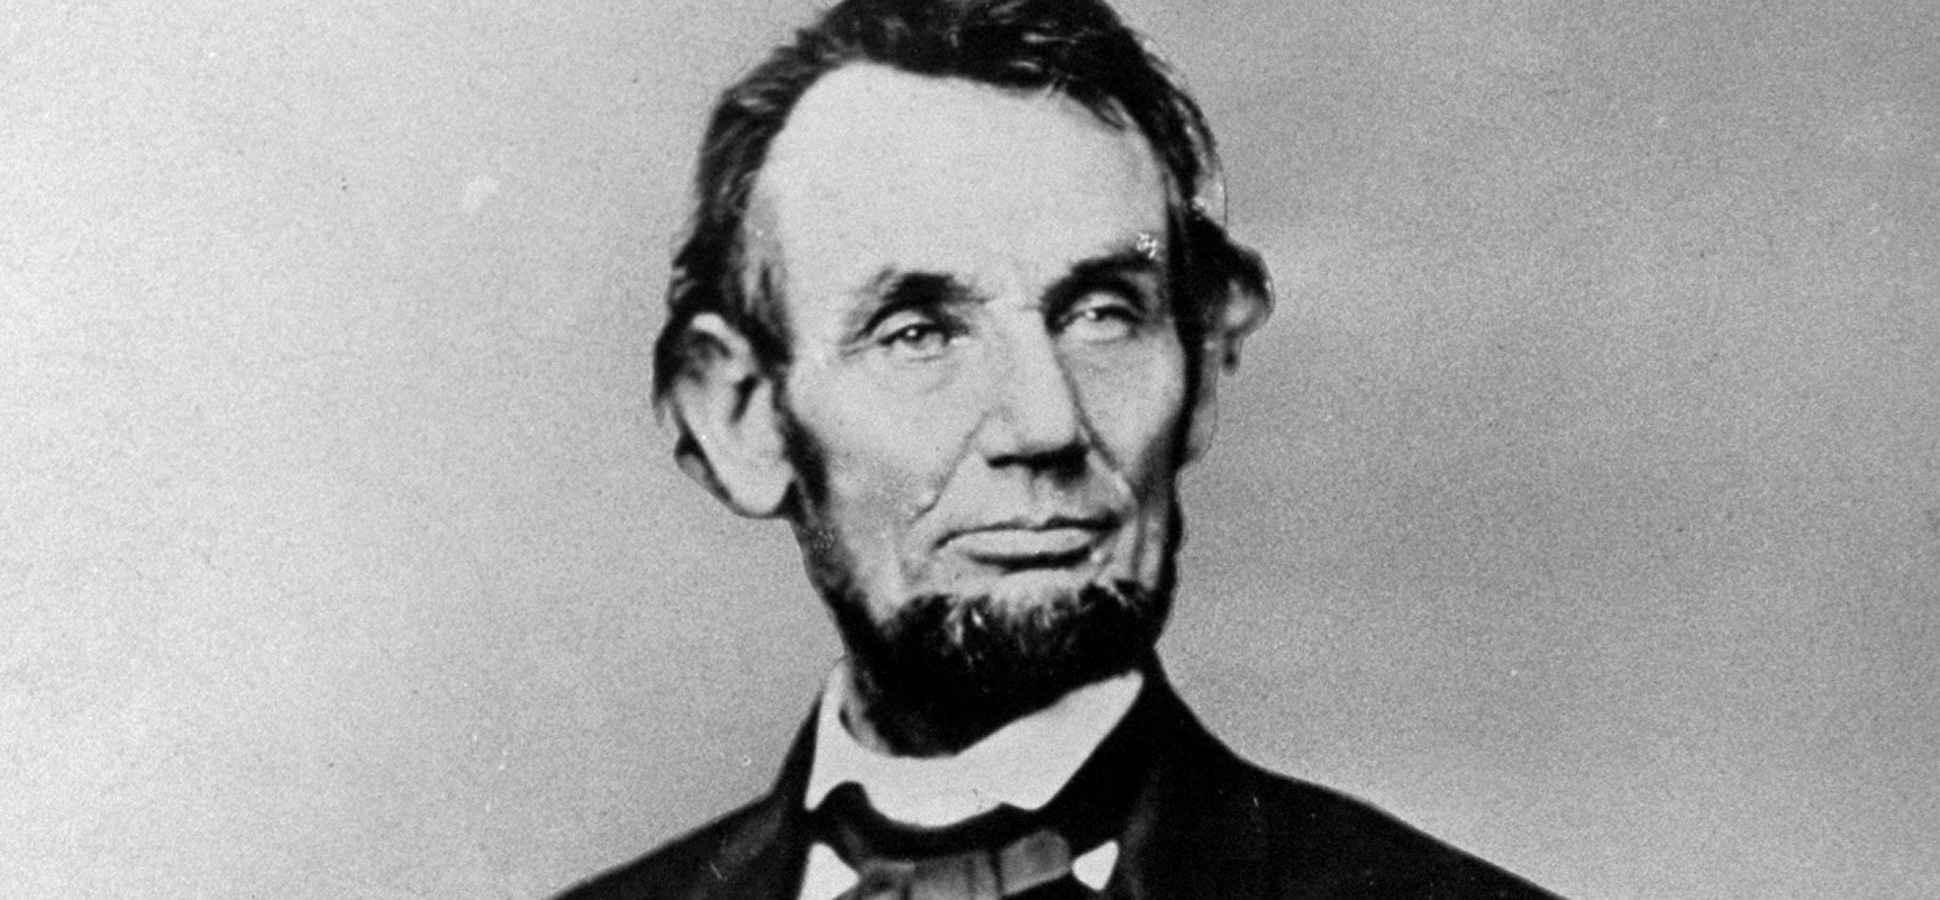 Wondrous Abraham Lincolns Brilliant Method For Handling Setbacks Inc Com Short Hairstyles Gunalazisus